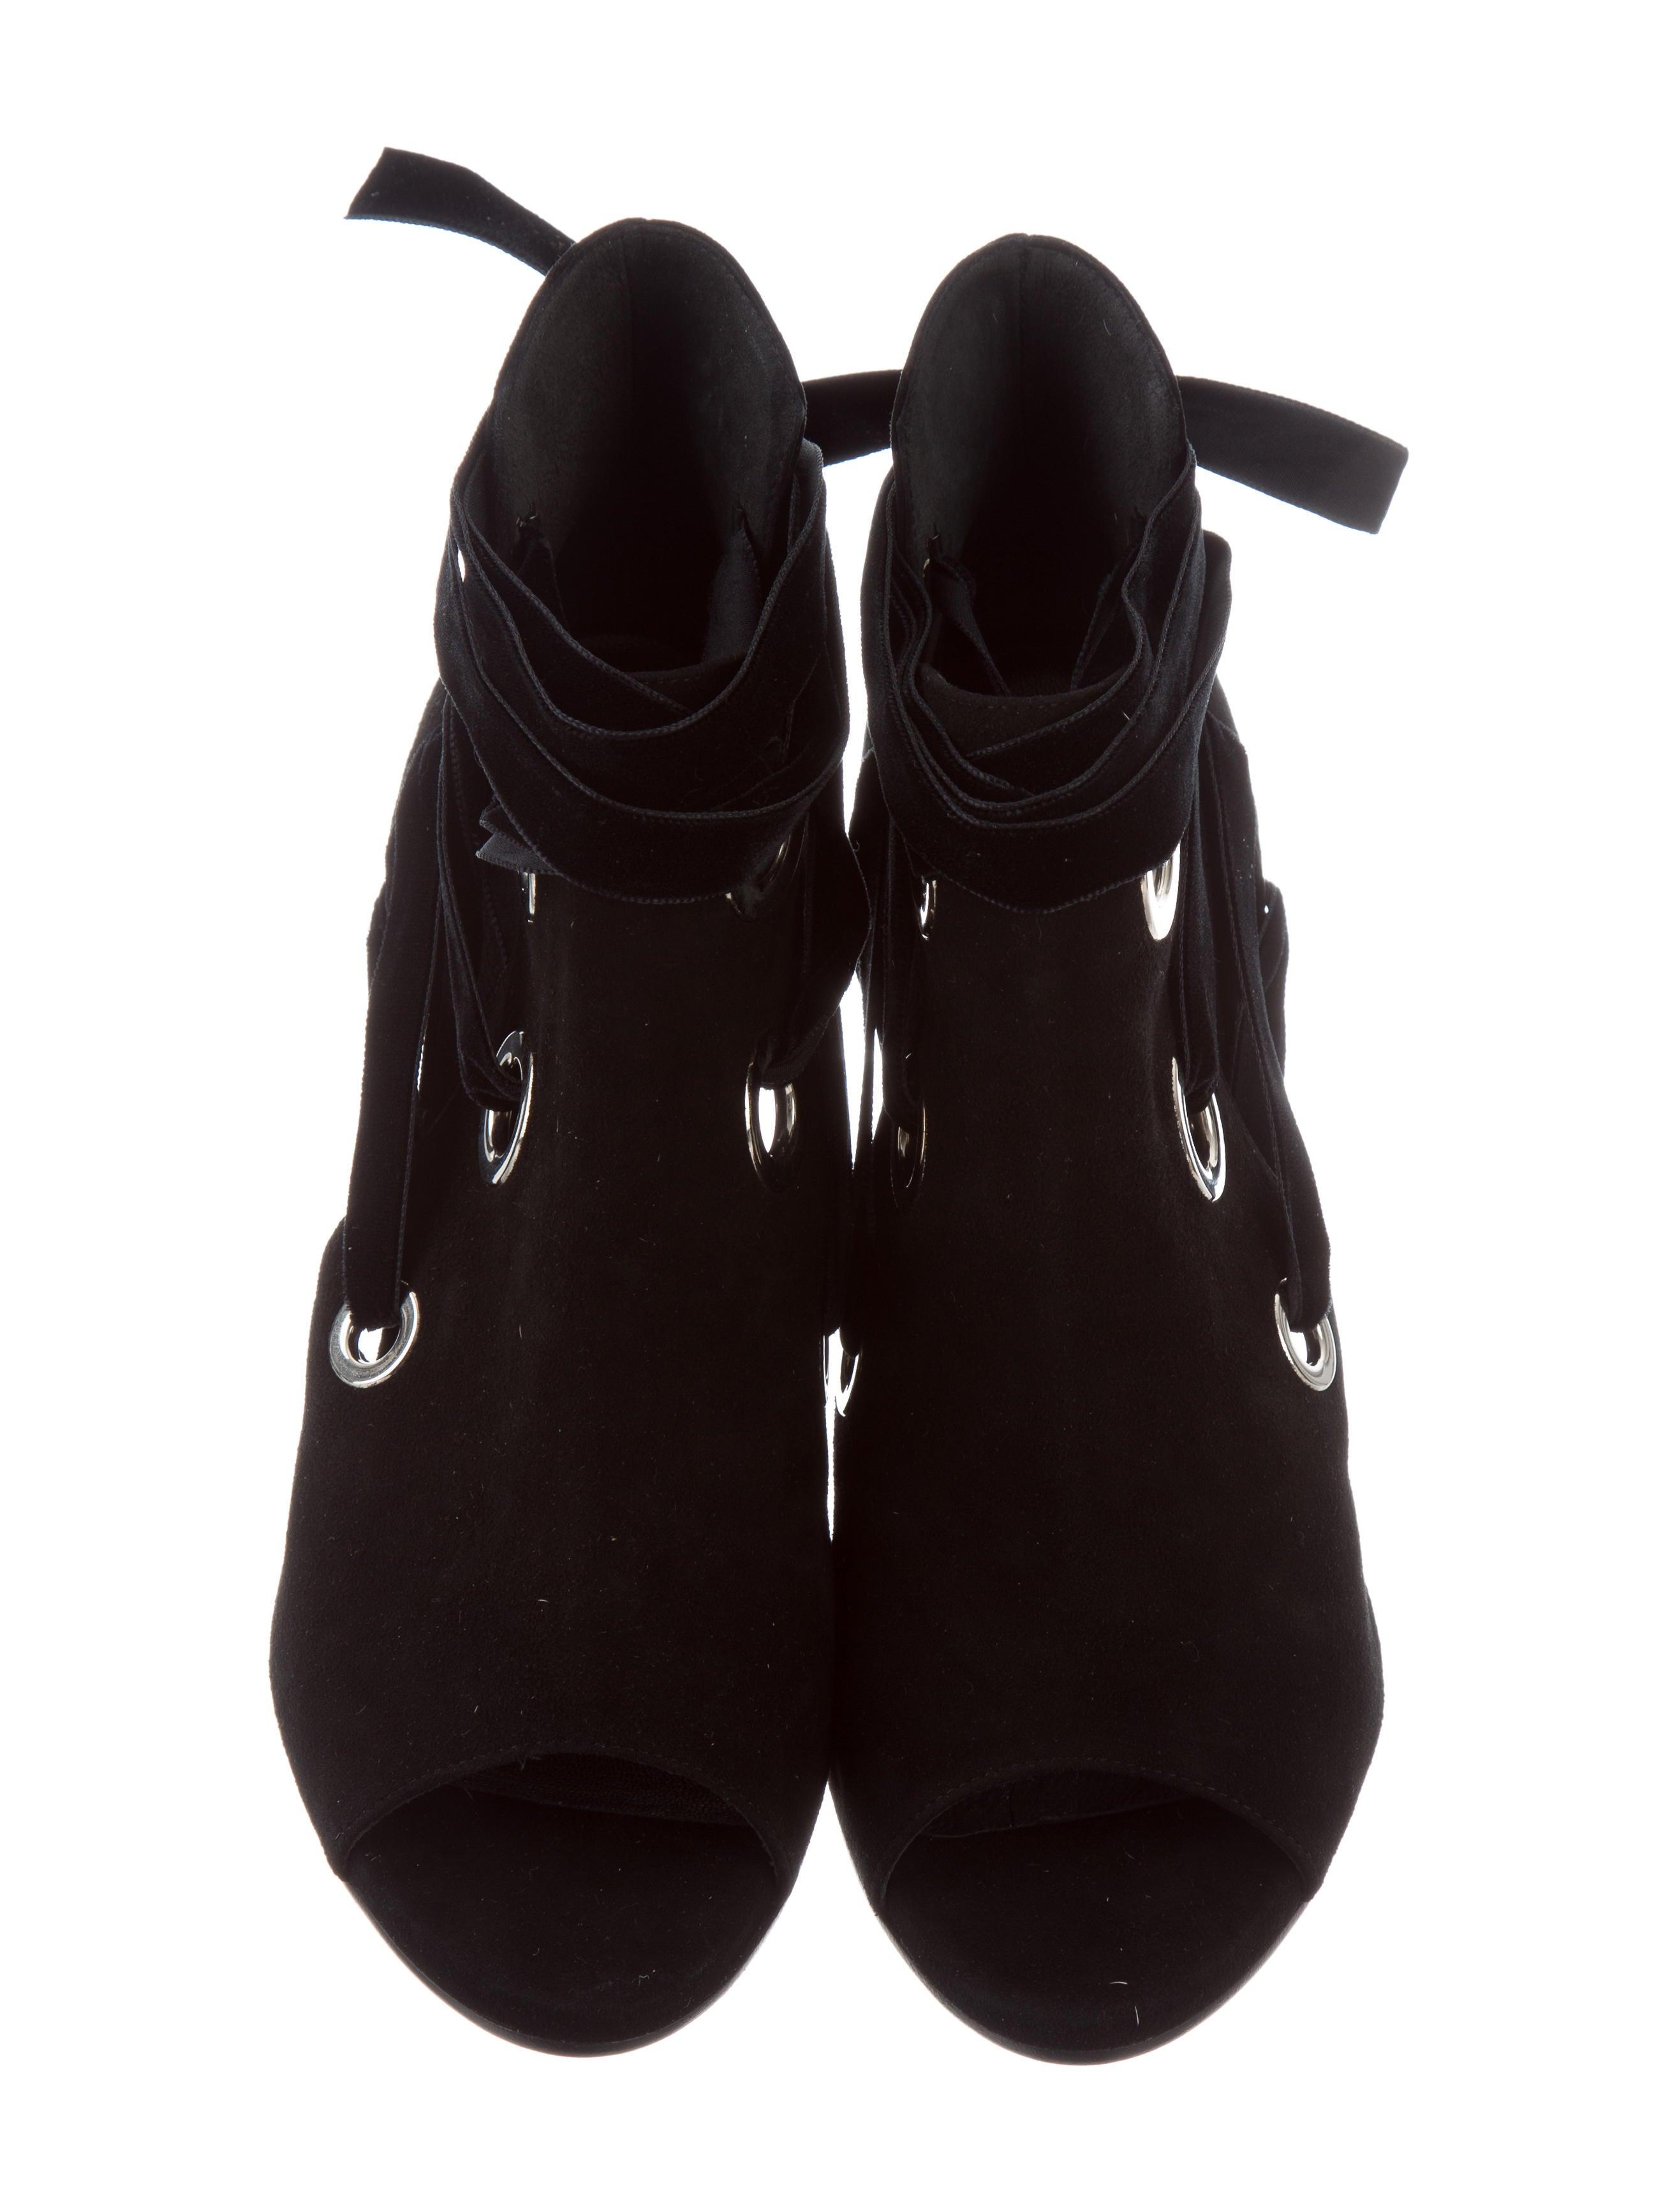 Aska Honor Suede Boots w/ Tags visa payment sale online 2KGne